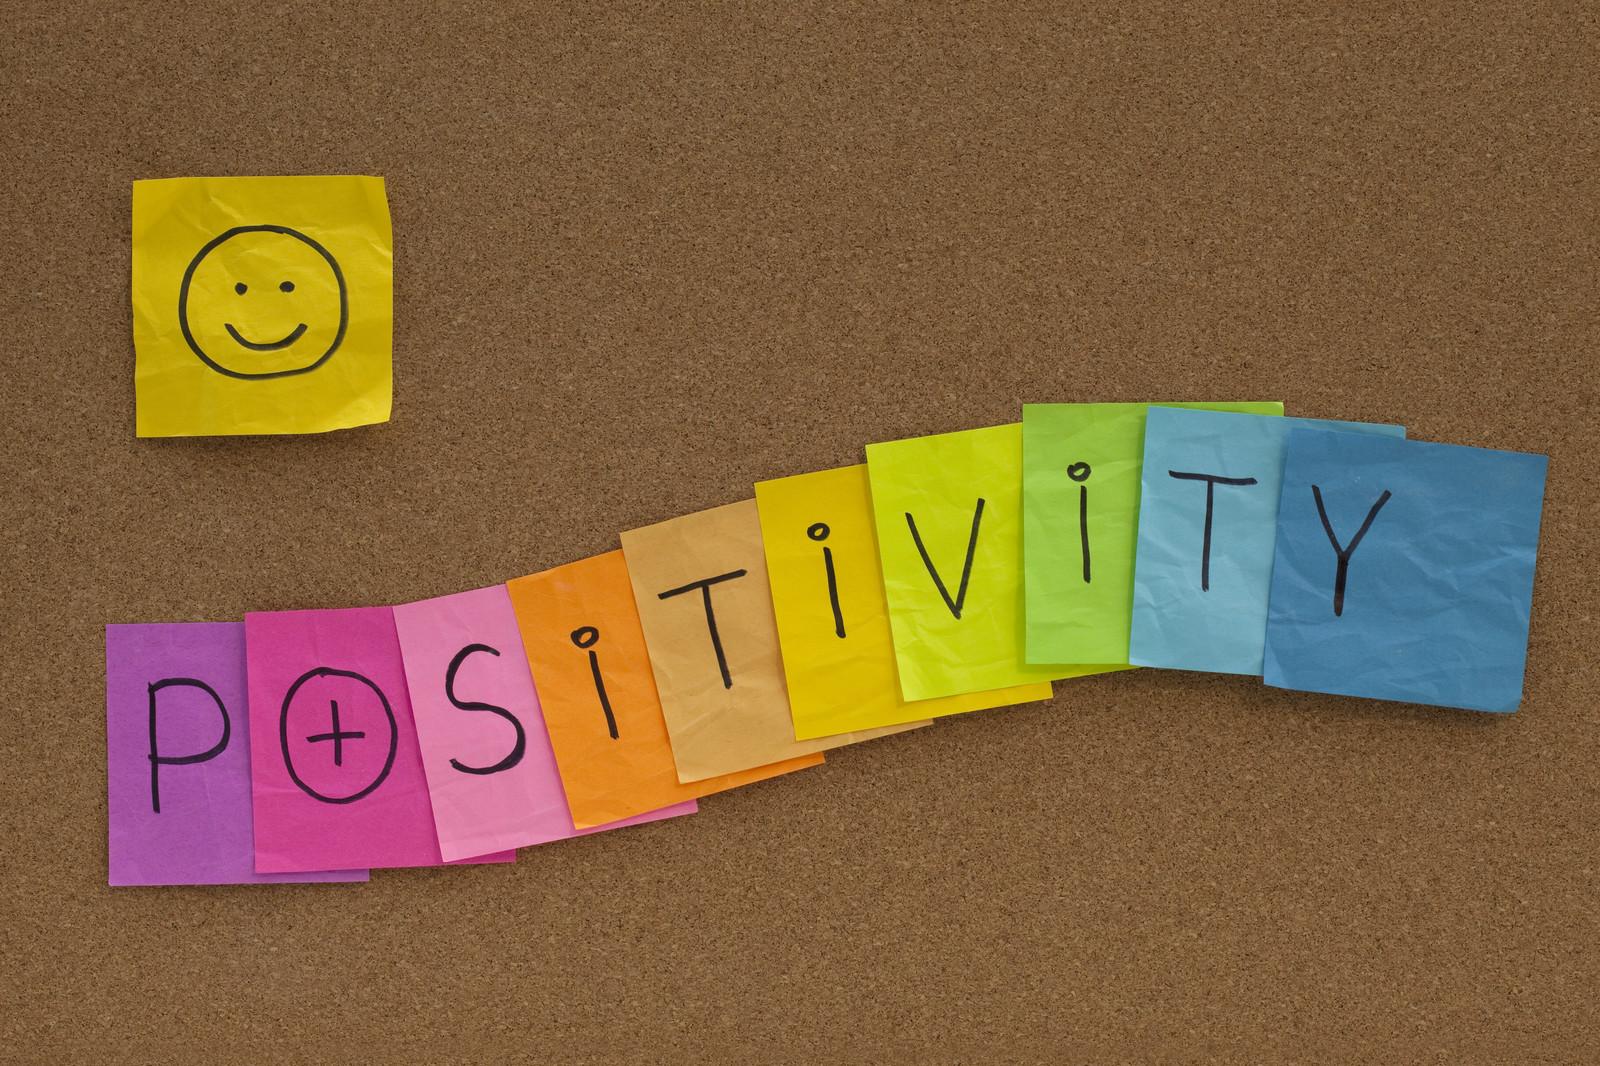 Tap Into Your Company's Power of Digital Positivity - Enterprise Irregulars